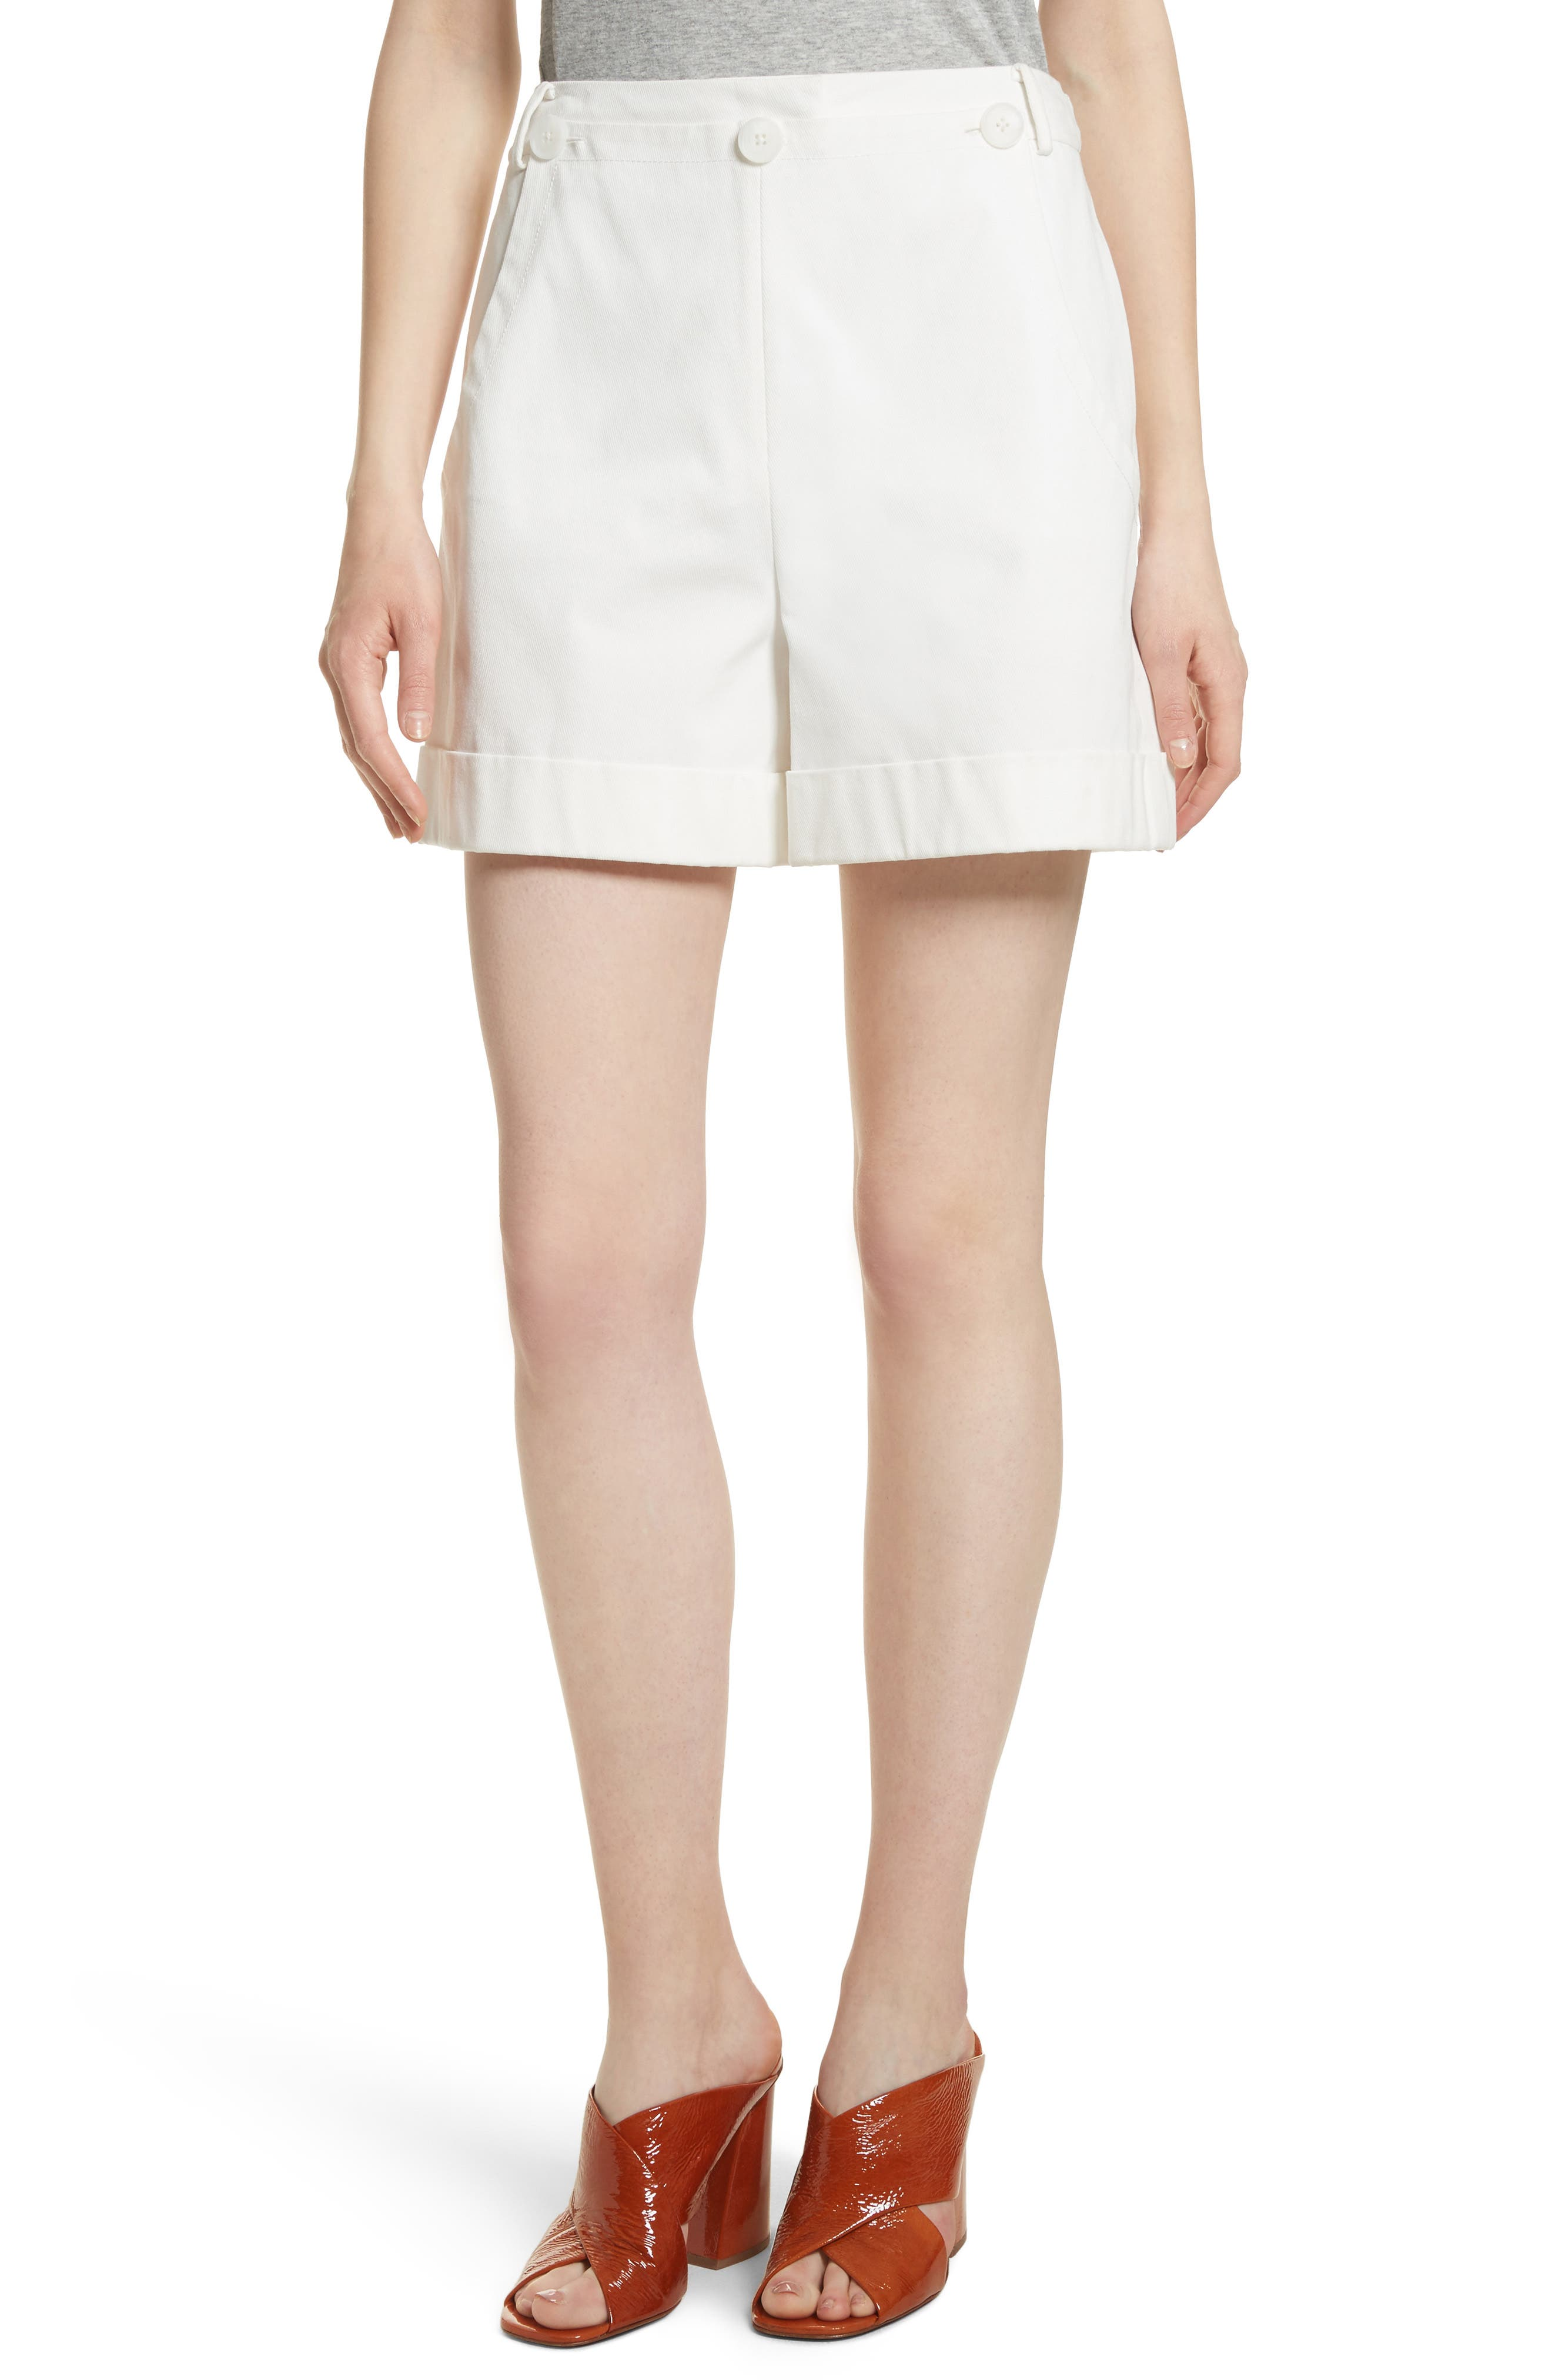 GREY Jason Wu Stretch Cotton Sailor Shorts